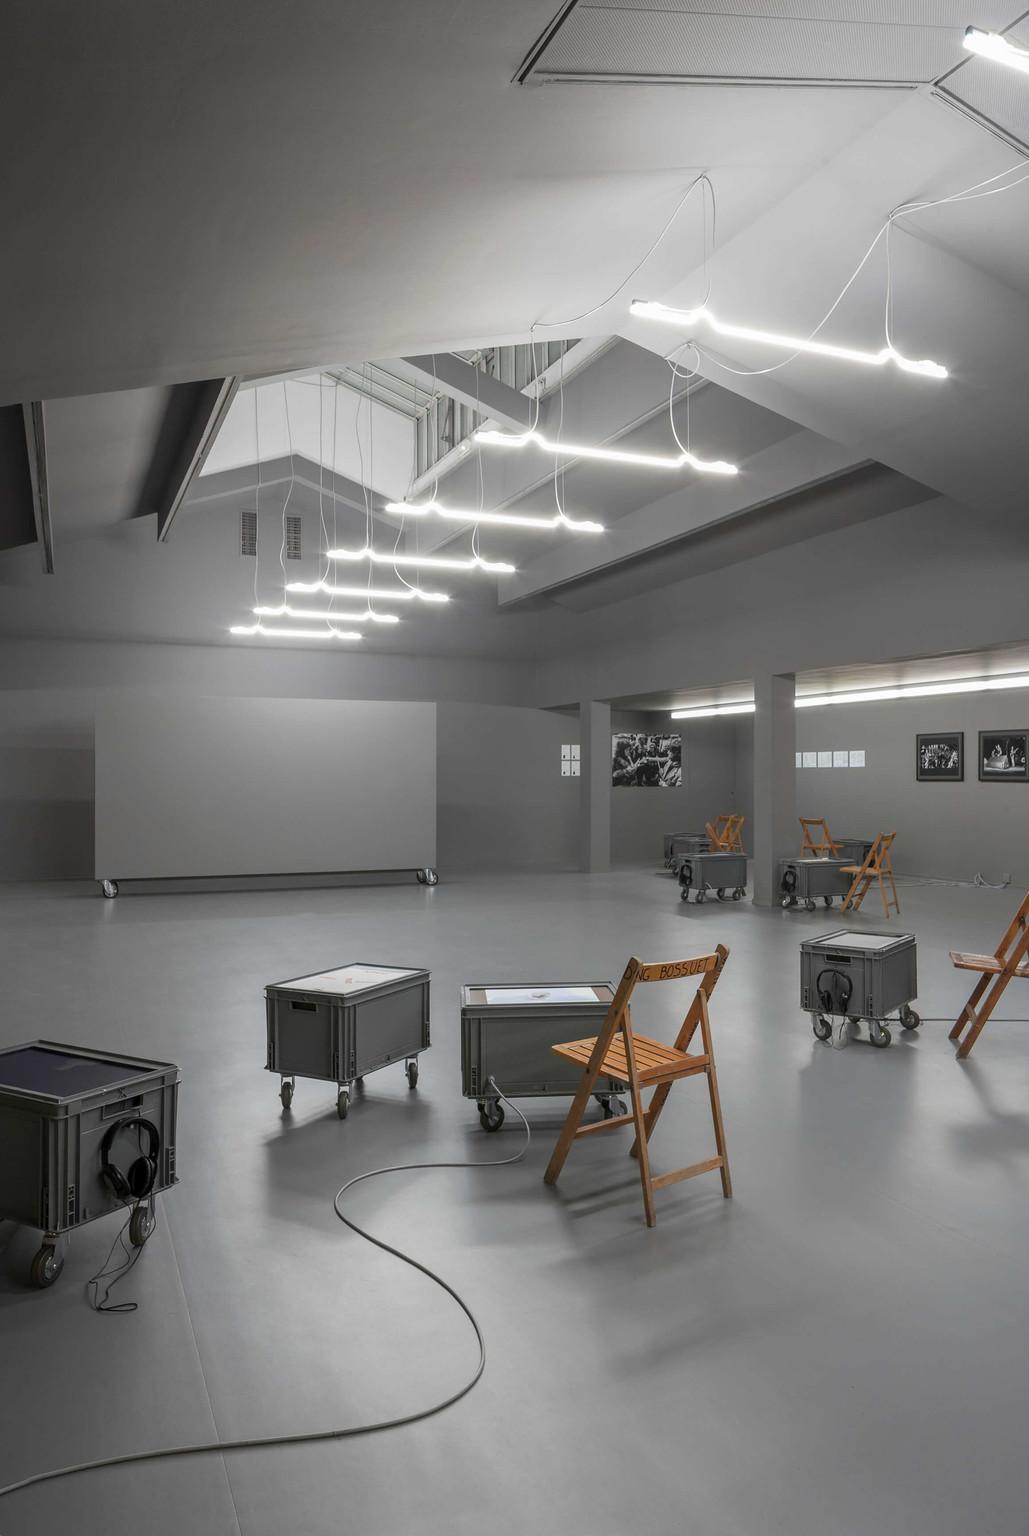 Scenography at the Centre Culturel Suisse de Paris - © Photograph: Dylan Perrenoud, Swiss Design Awards Blog